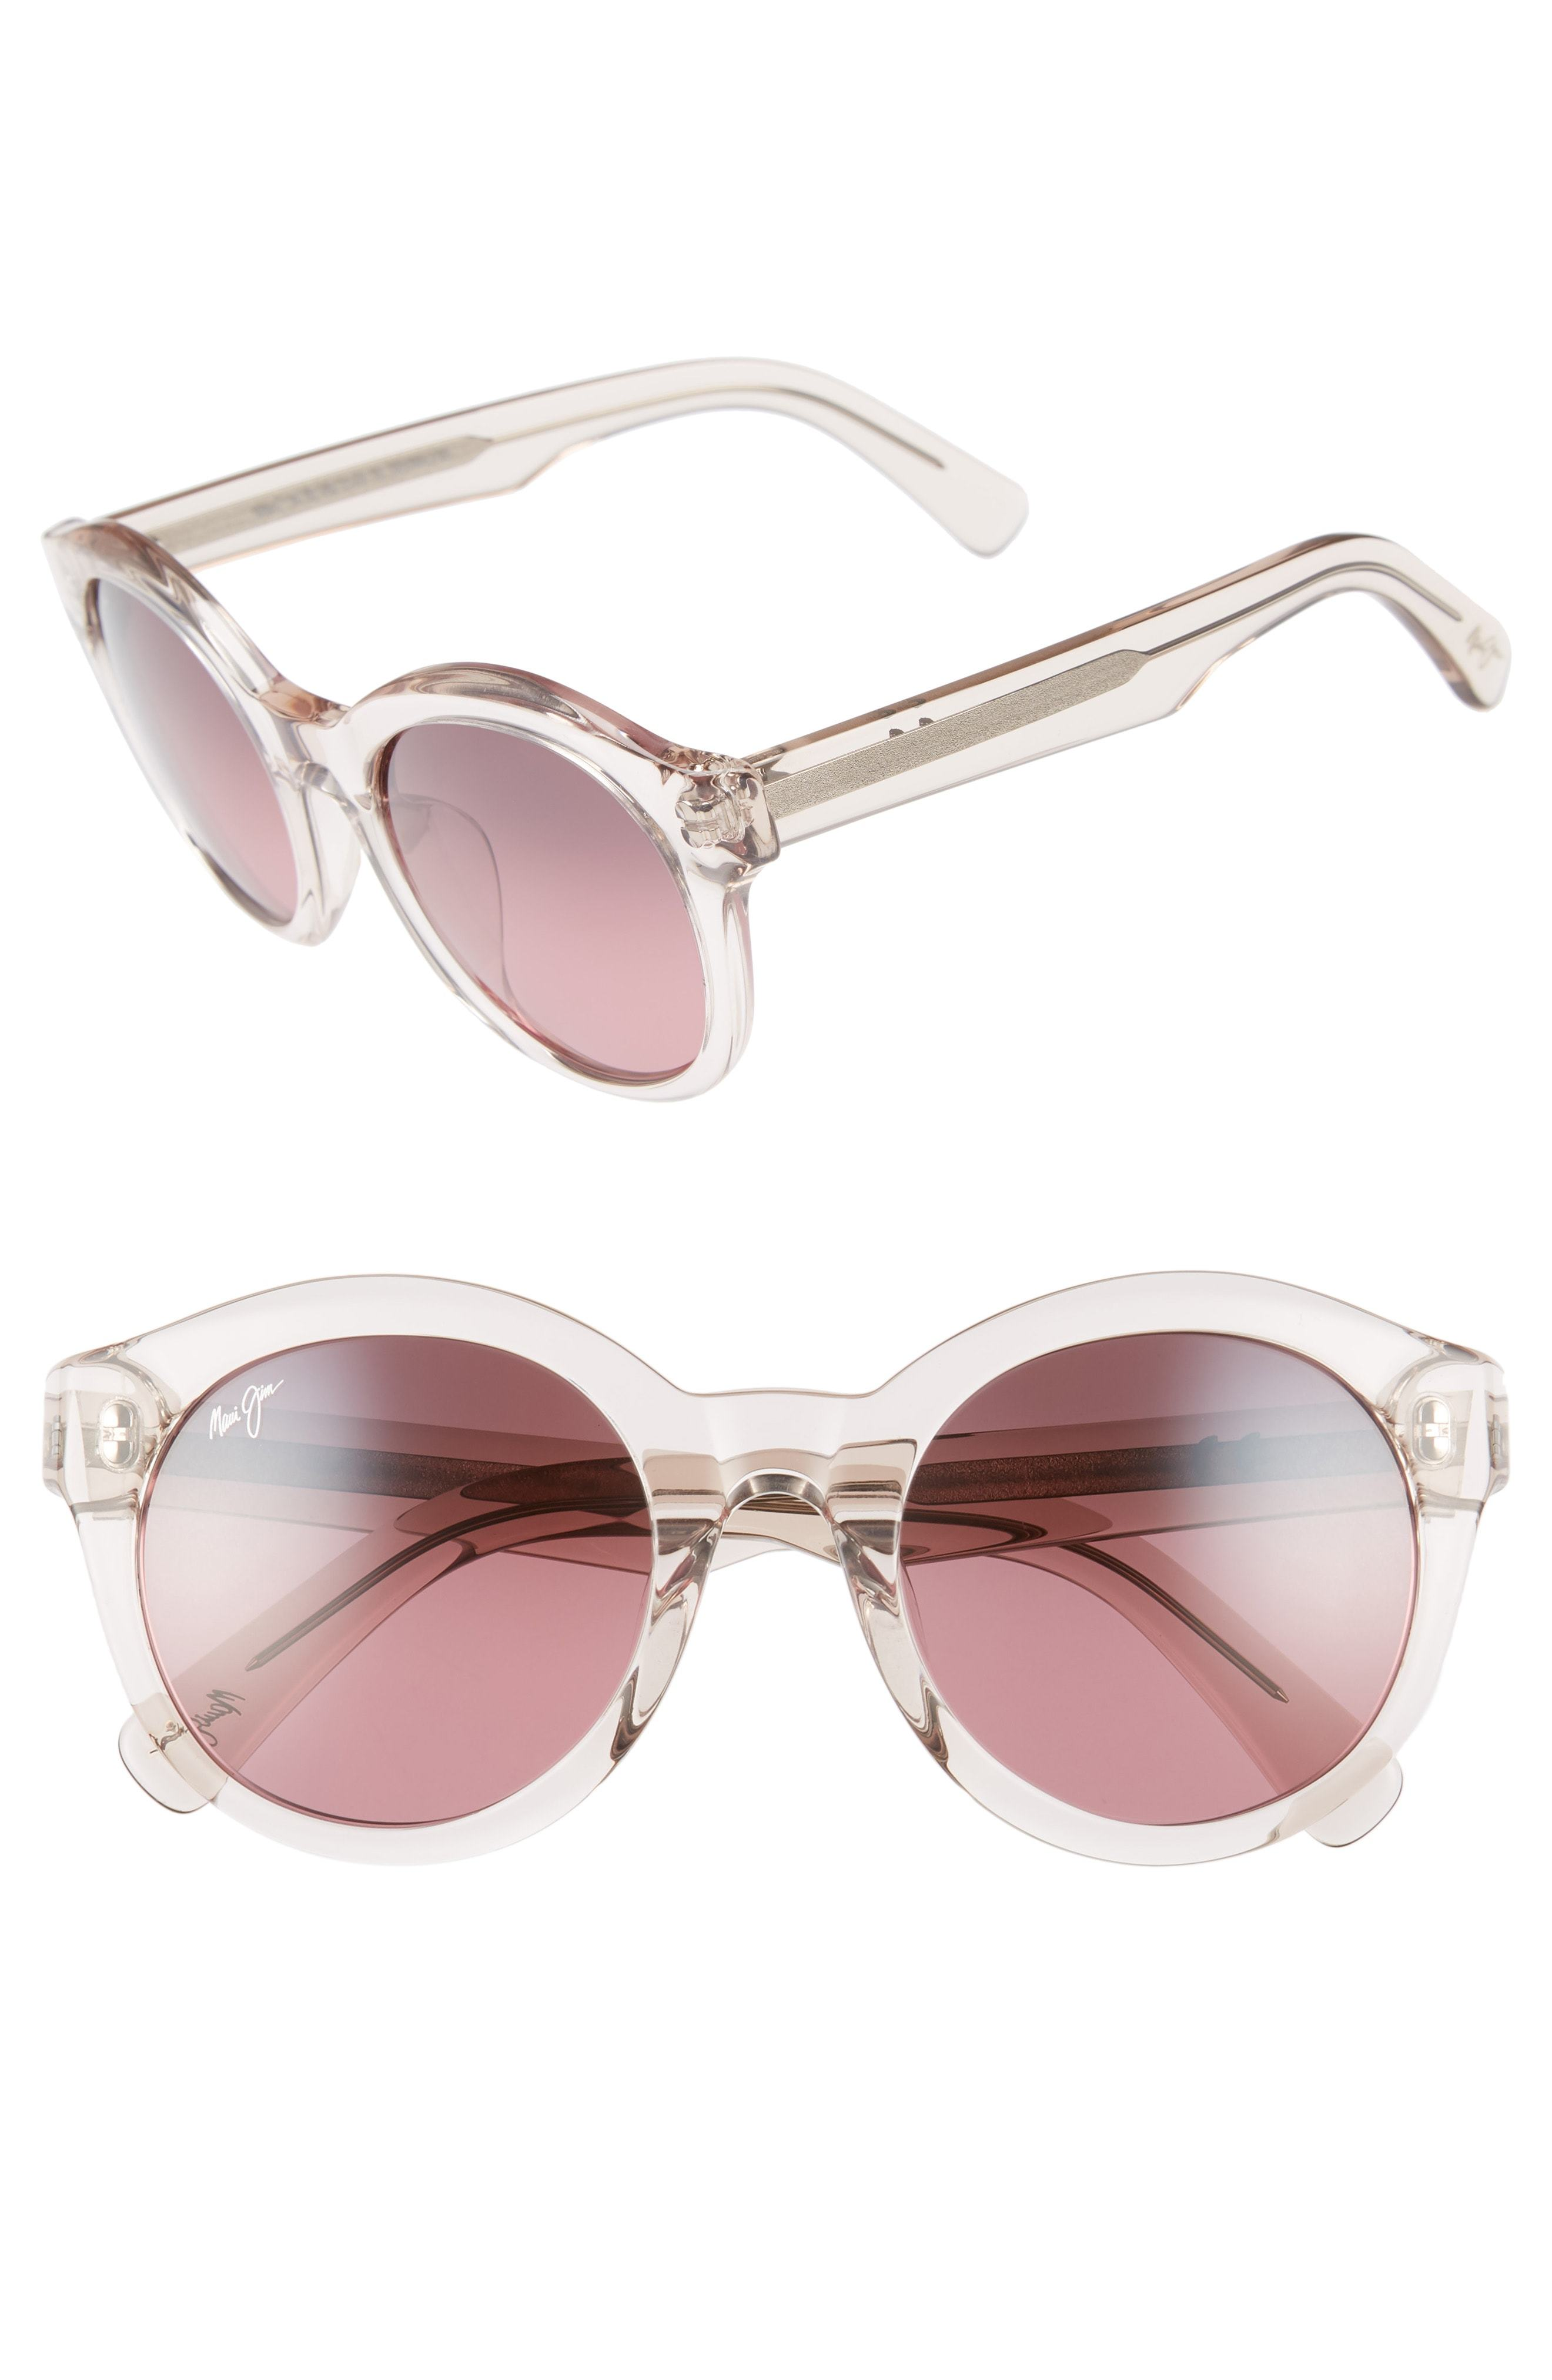 2d50065e21 Maui Jim Jasmine 51mm Polarizedplus2 Round Sunglasses, $319 ...